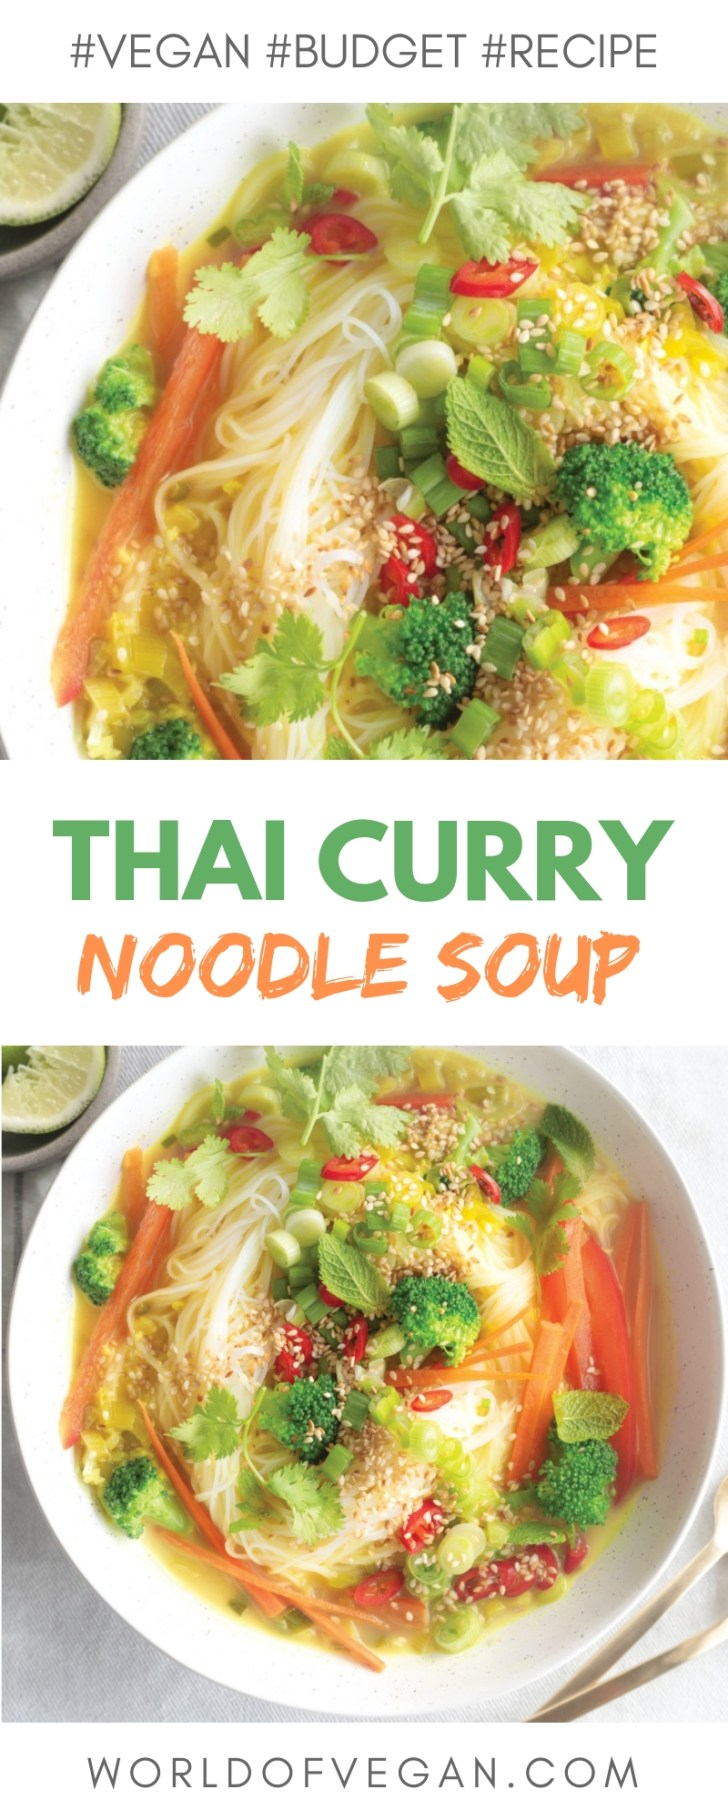 Thai Vermicelli Noodle Soup | Easy Vegan Recipe | WorldofVegan.com | #soup #thai #curry #vermicelli #noodle #winter #cozy #recipe #dinner #vegetarian